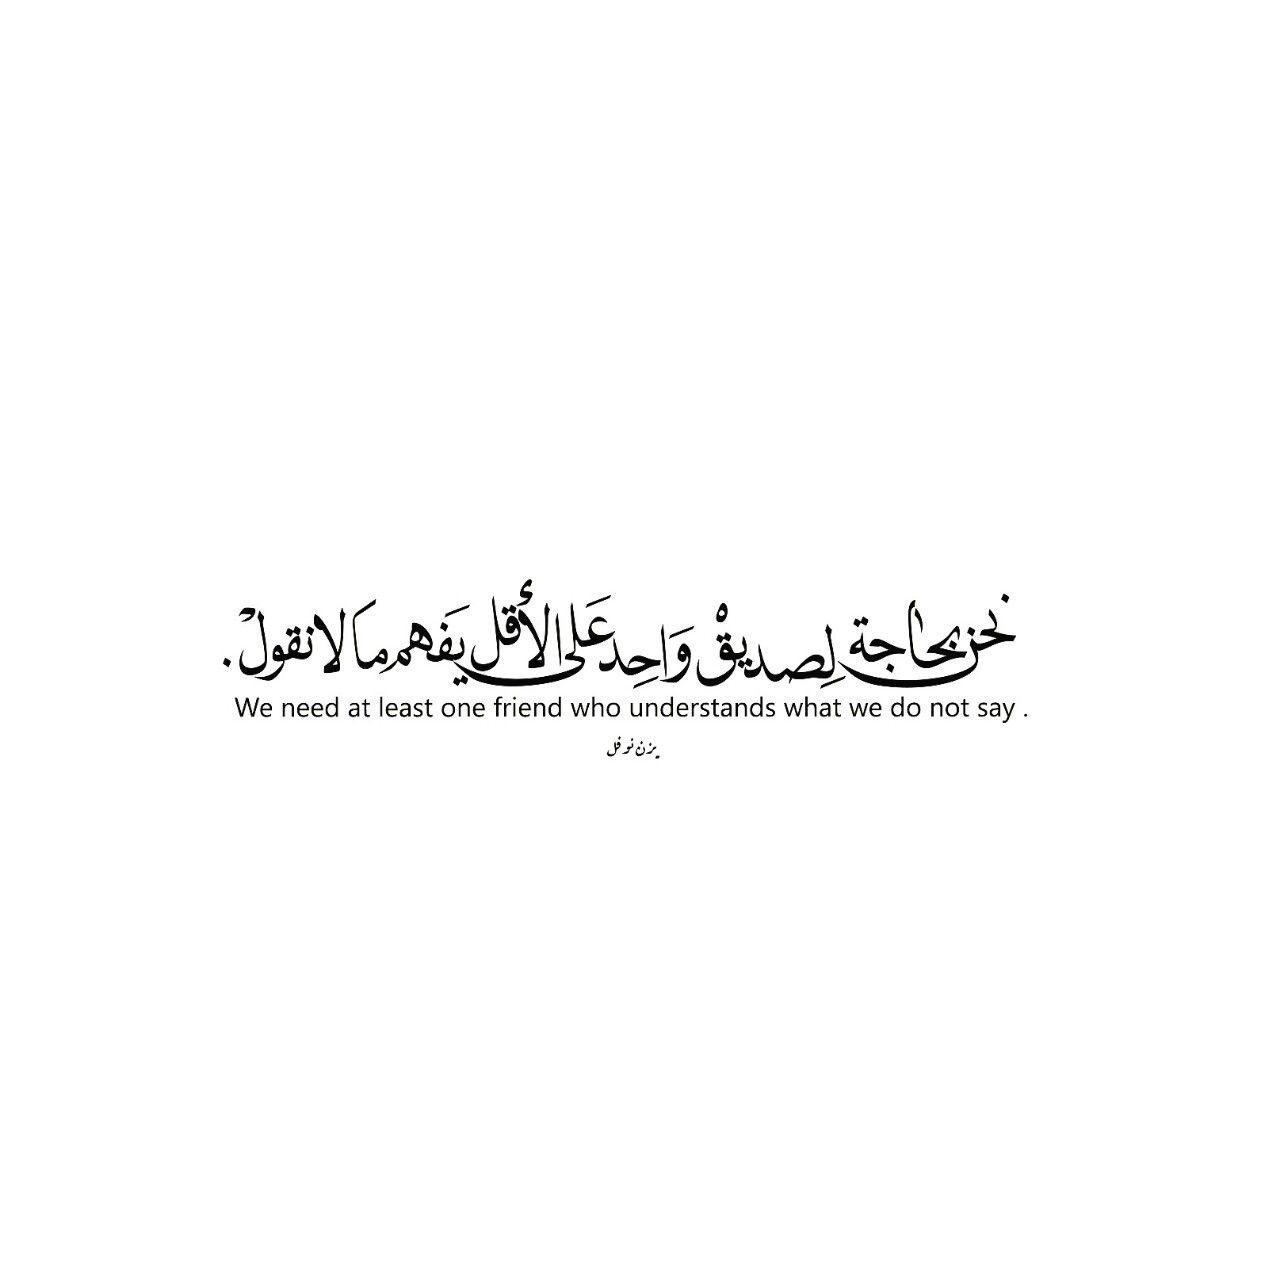 U0645u0627 u0644u0627 u0646u0642u0648u06443u0026gt; | Arabic ufe0f u0627u0644u0639u0631u0628u064a u0623u062du0644u0649 | Pinterest | Arabic quotes Islam and Islamic